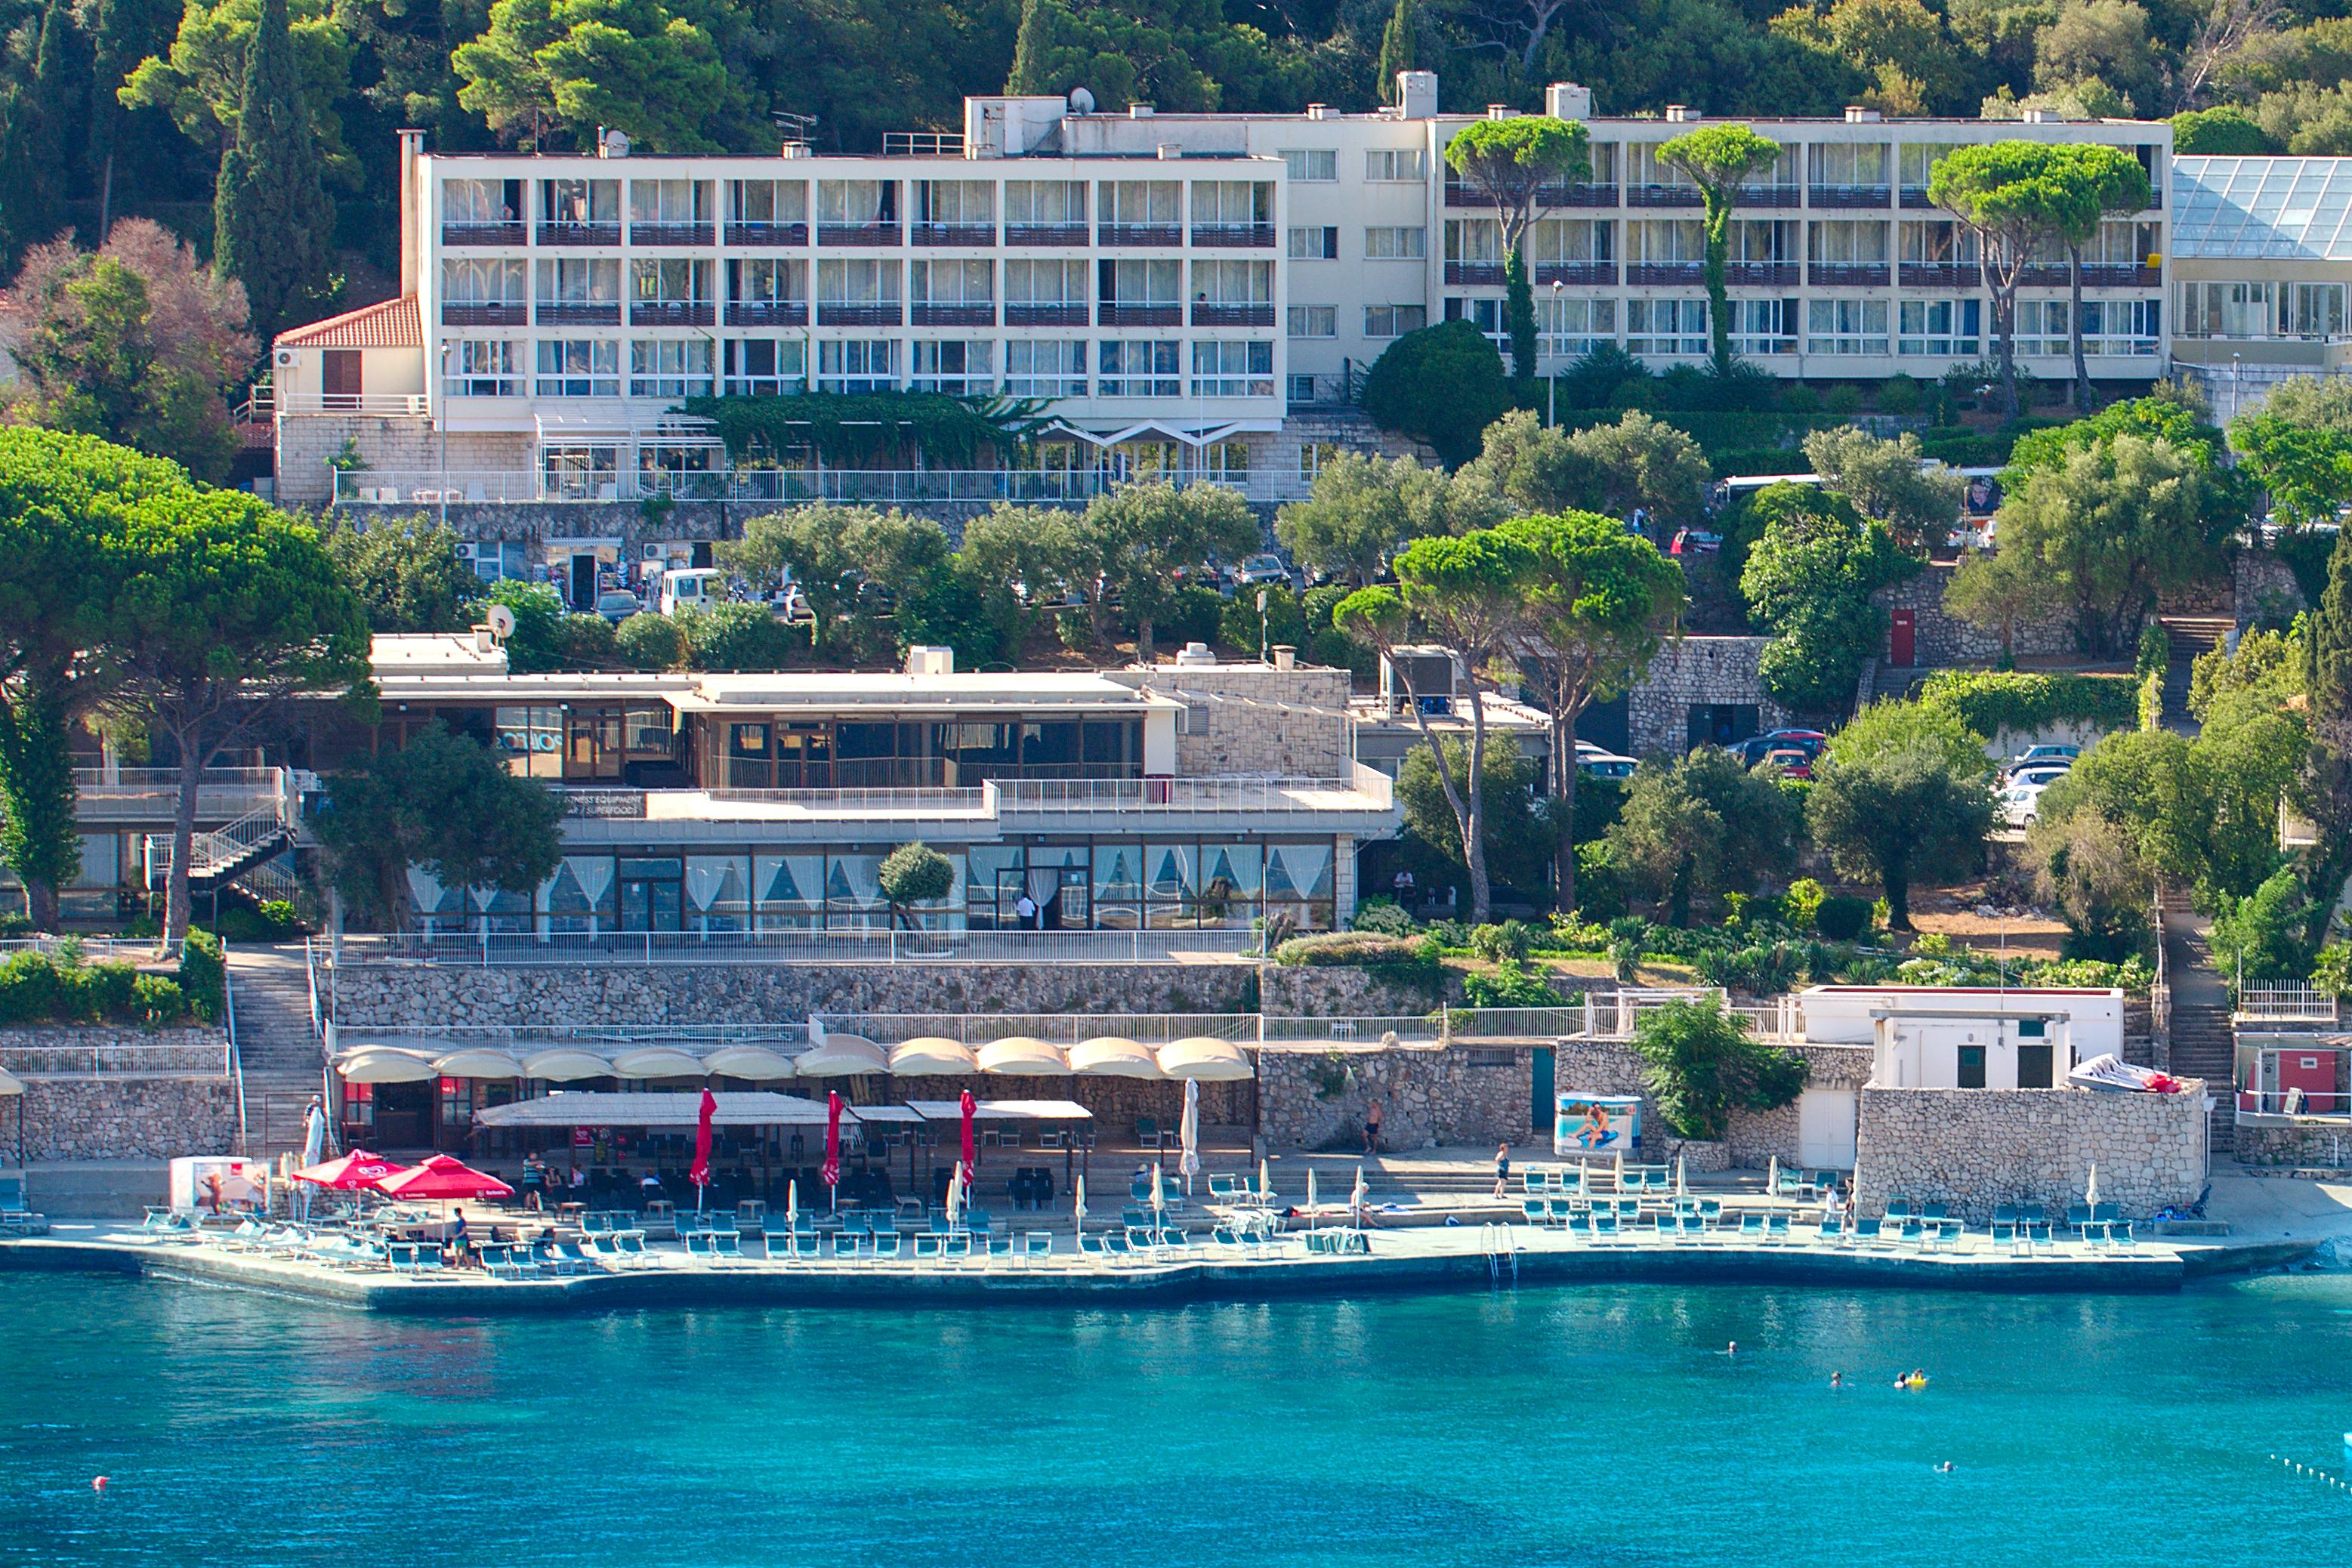 adriatic-hotel-beach-lapadbay-hotelgroun